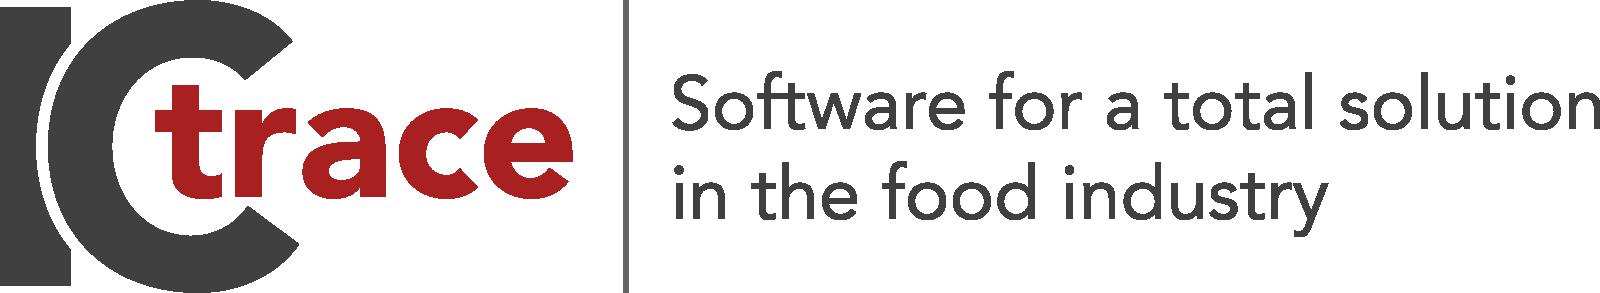 2019 07 15 Logo IC Trace